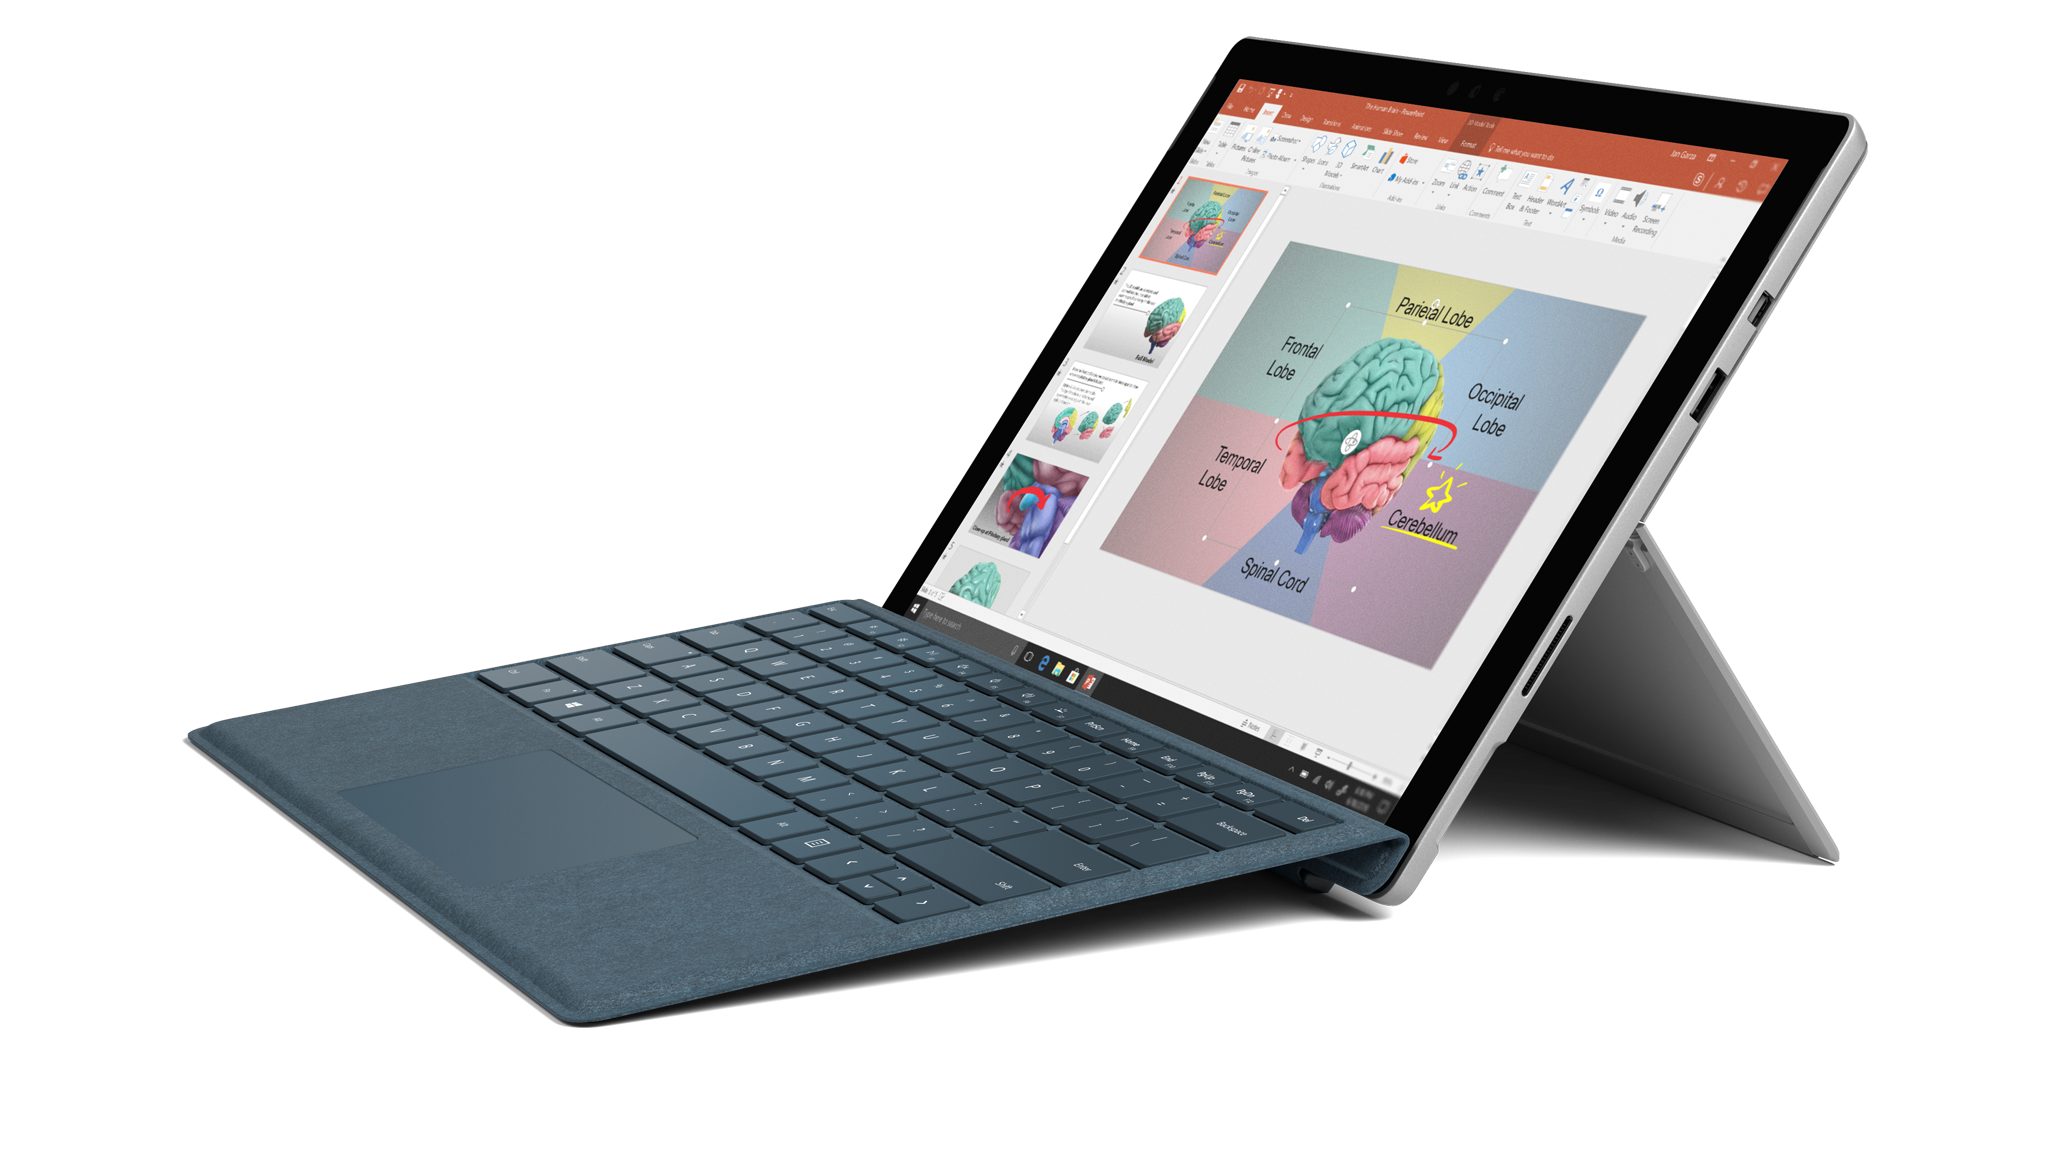 مظهر جانبي لجهاز Surface Pro